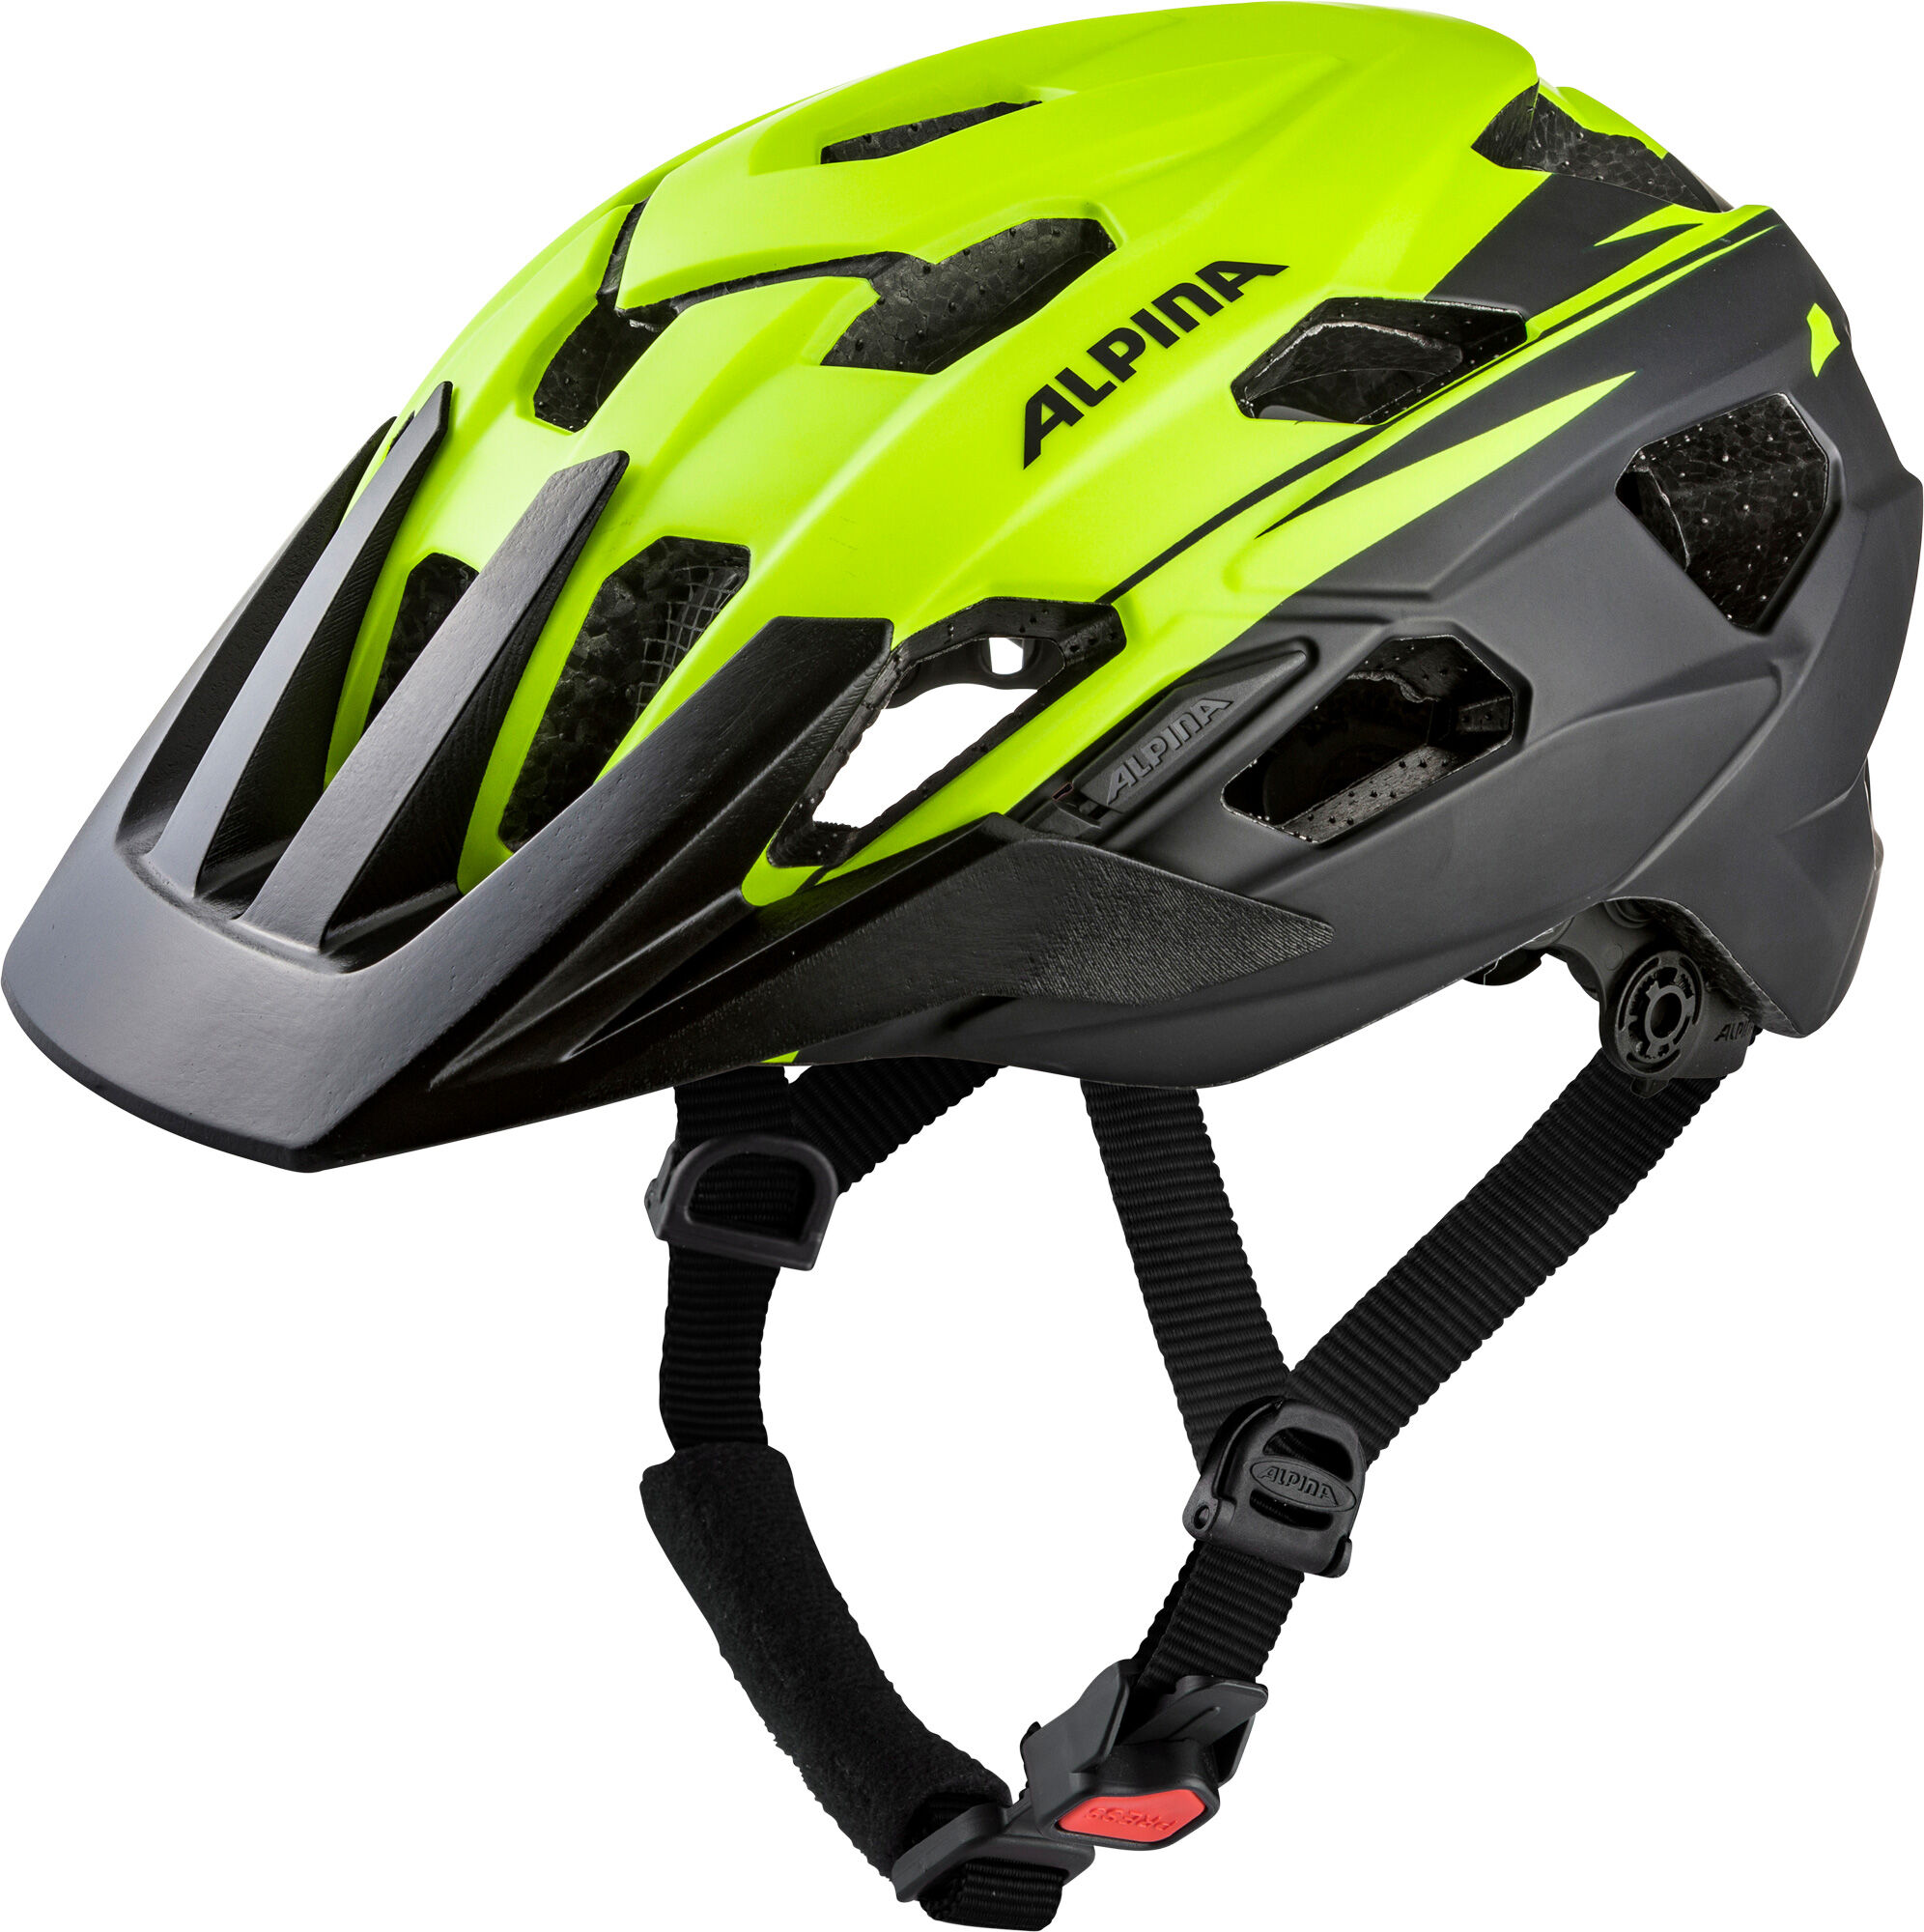 fahrrad crosshelm für kinder assign